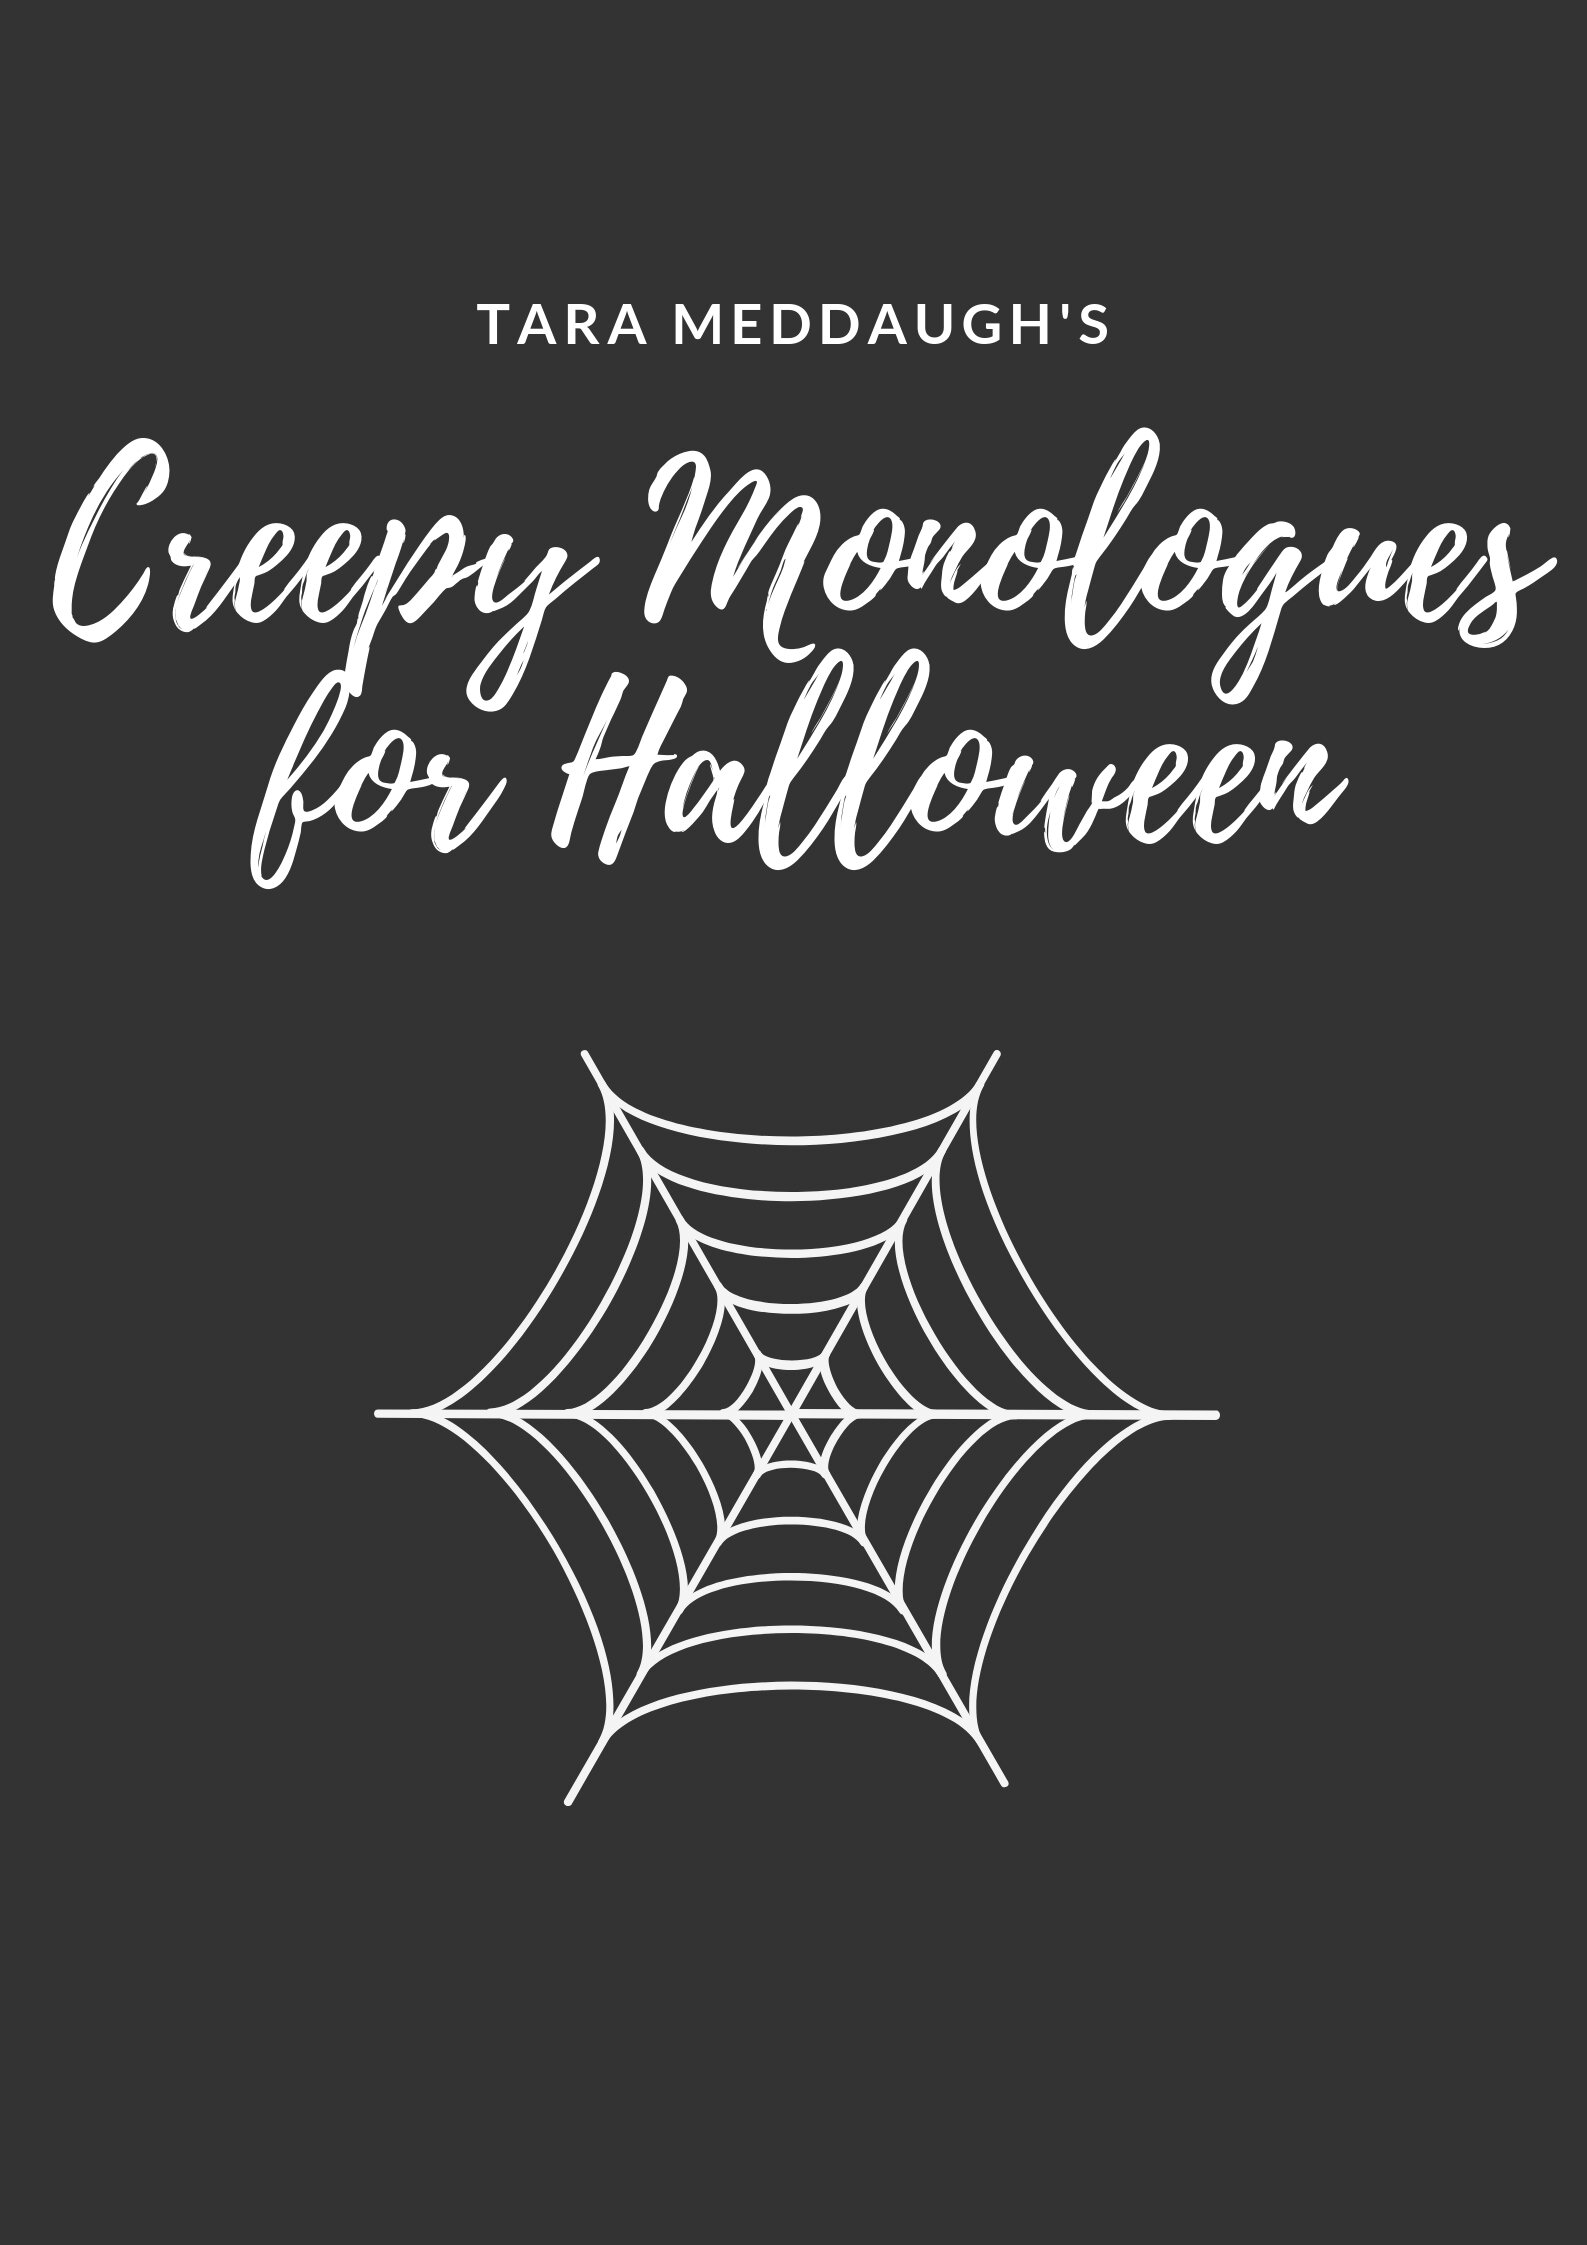 creepy monologues for halloween.jpg